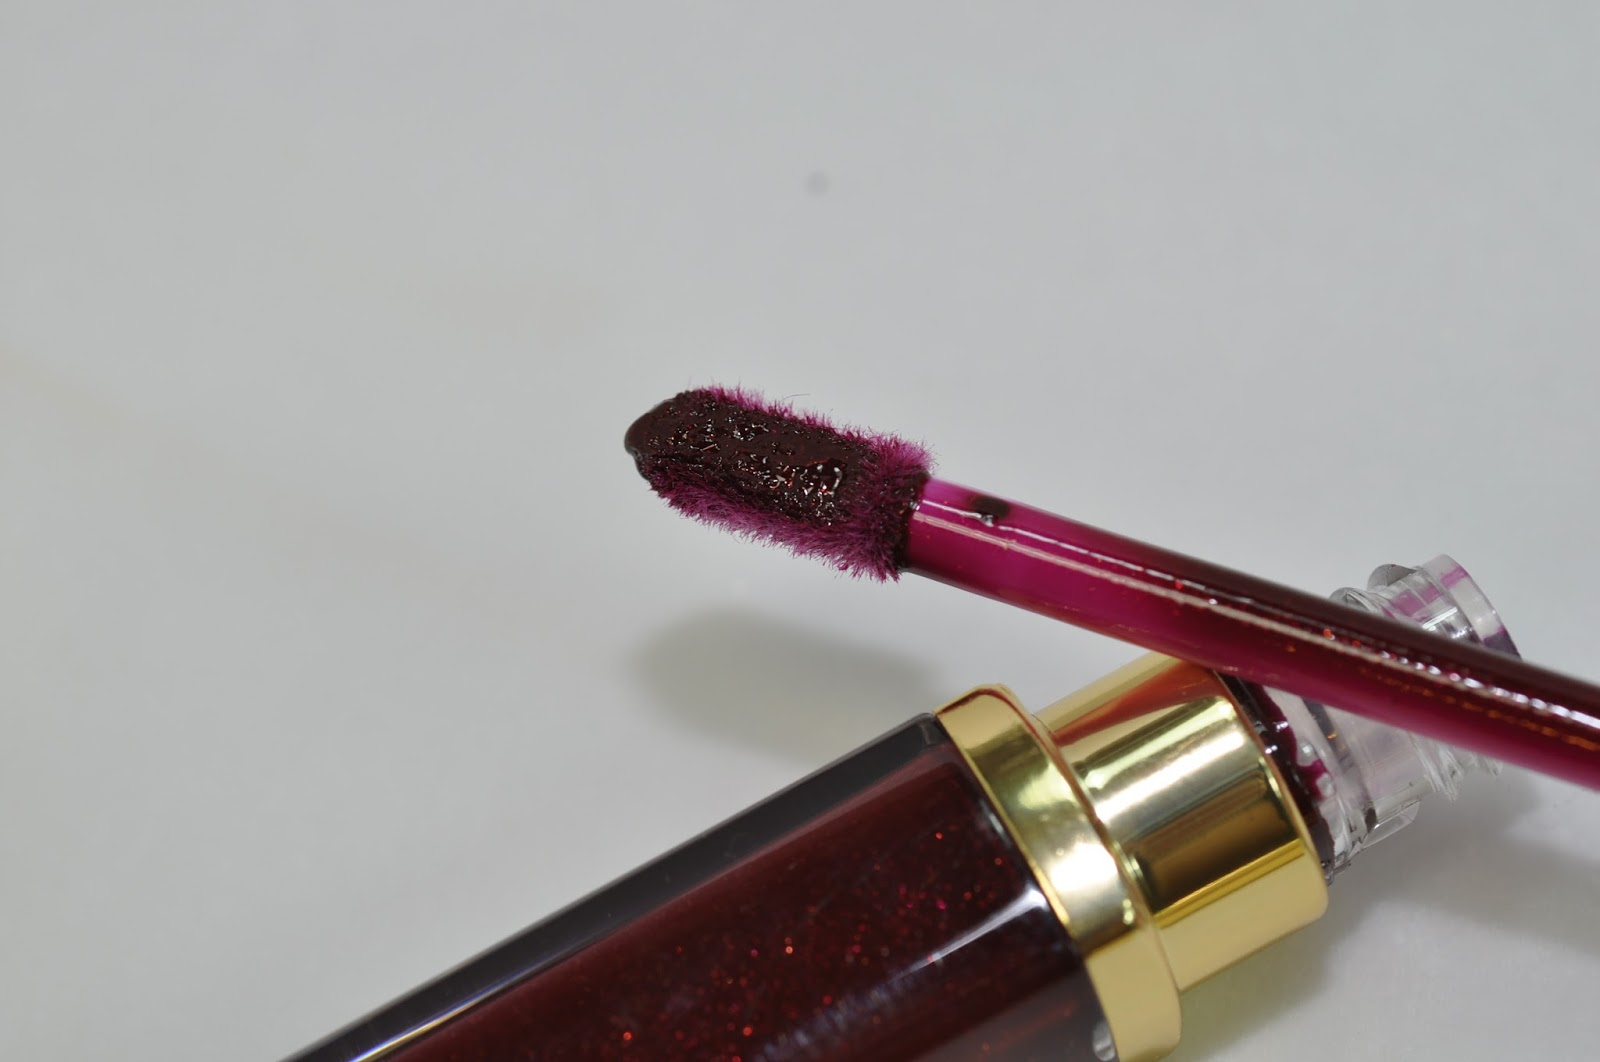 New Estee Lauder Pure Color High Intensity Lip Lacquer